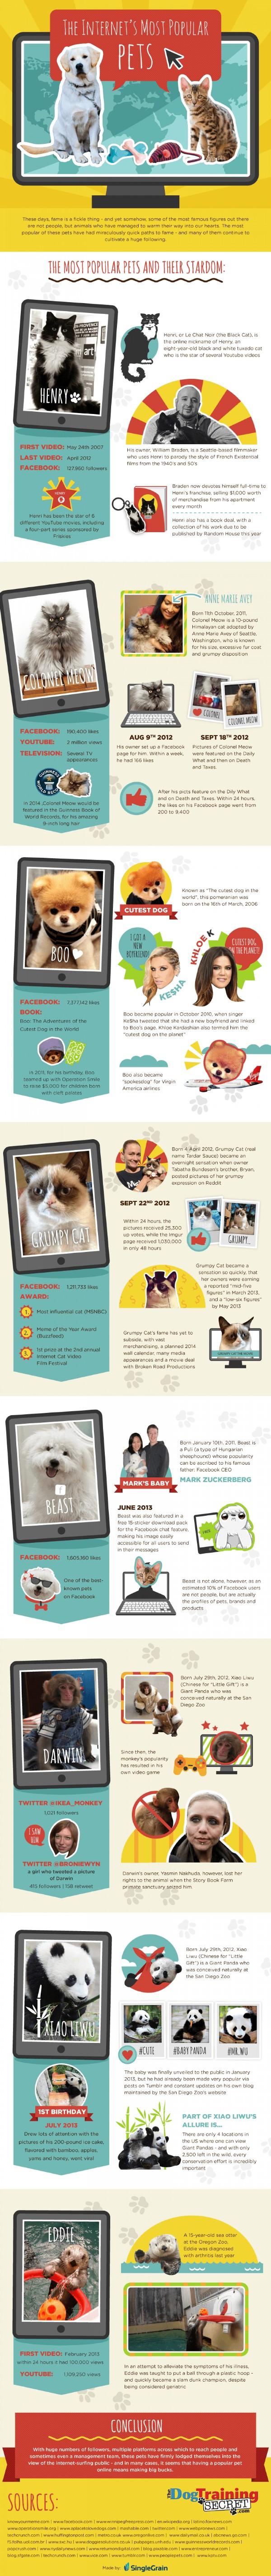 the-internets-most-popular-pets_5277fc6931b3e_w1500